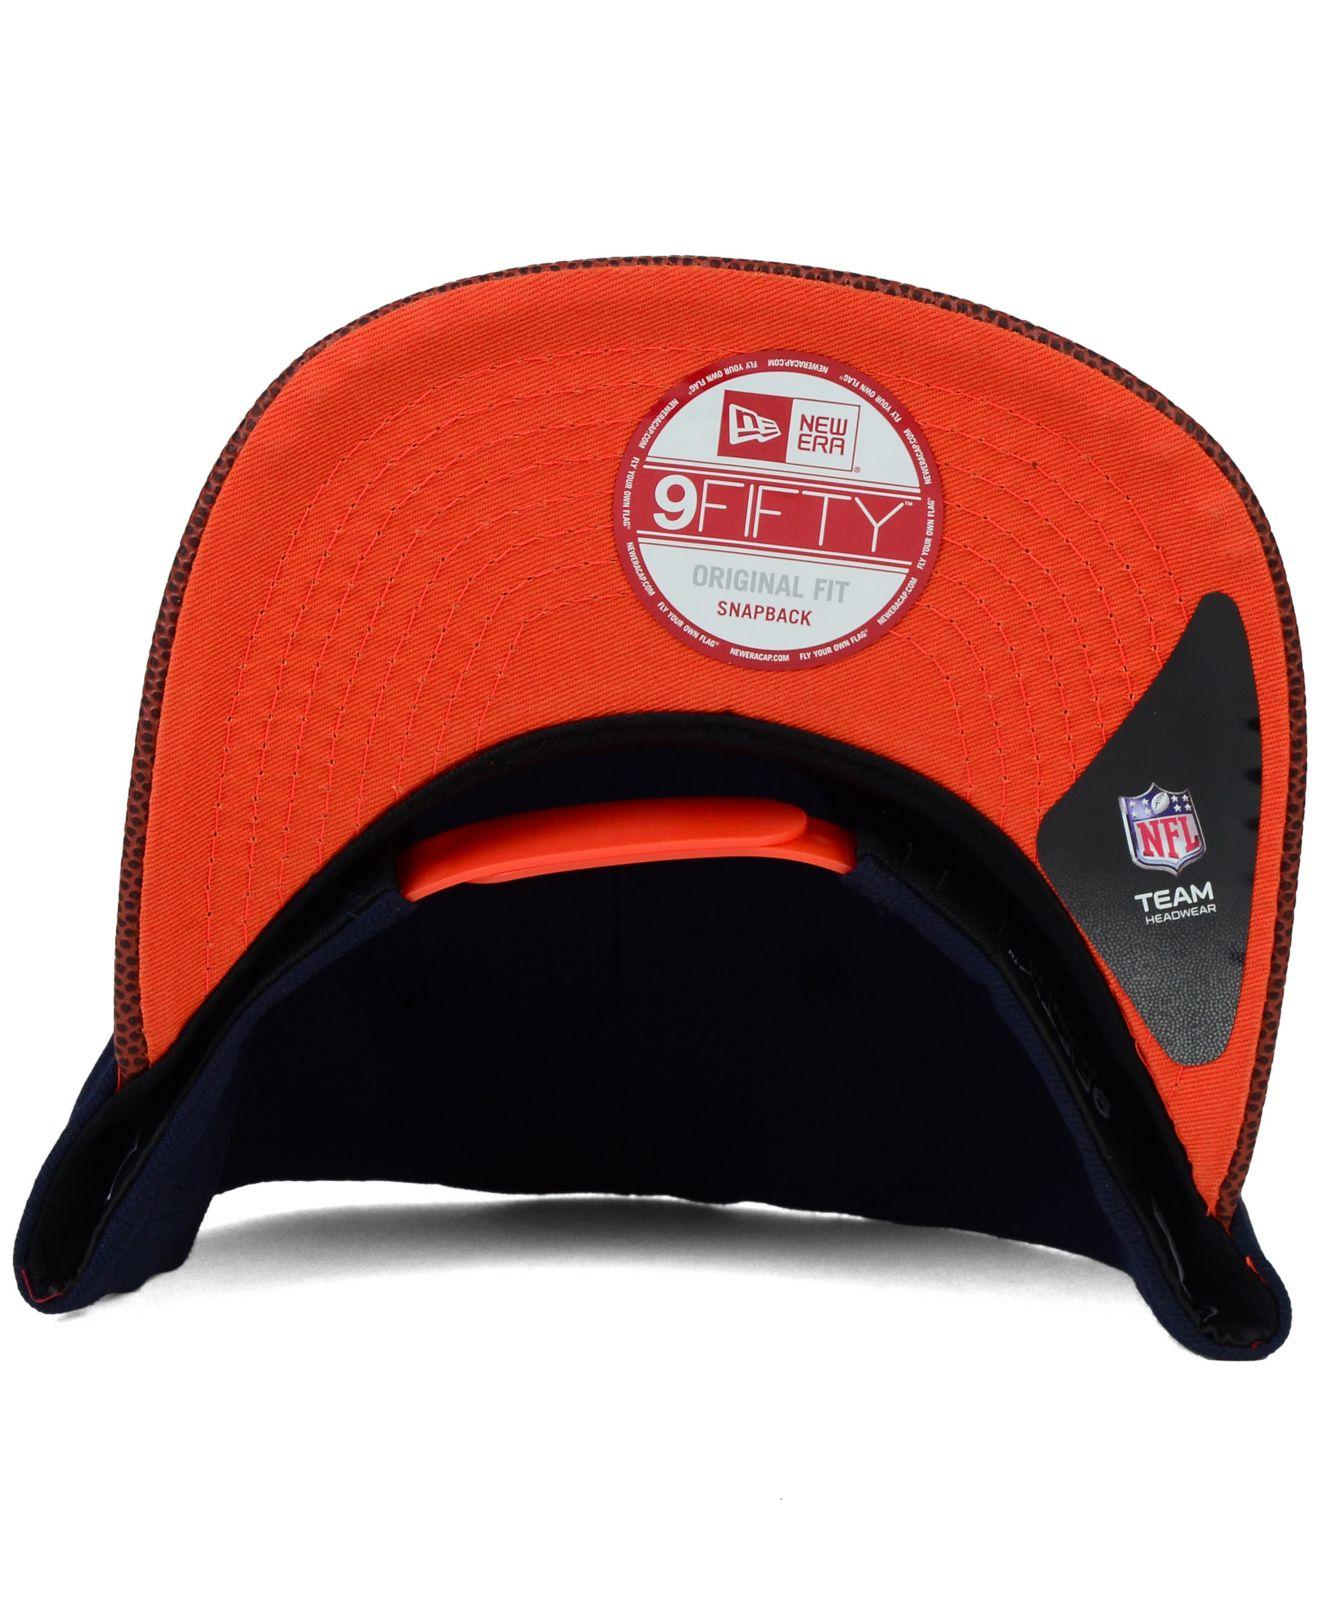 4e6b3a352afe95 KTZ Chicago Bears Super Bowl Xx Athlete Vize 9fifty Snapback Cap in ...